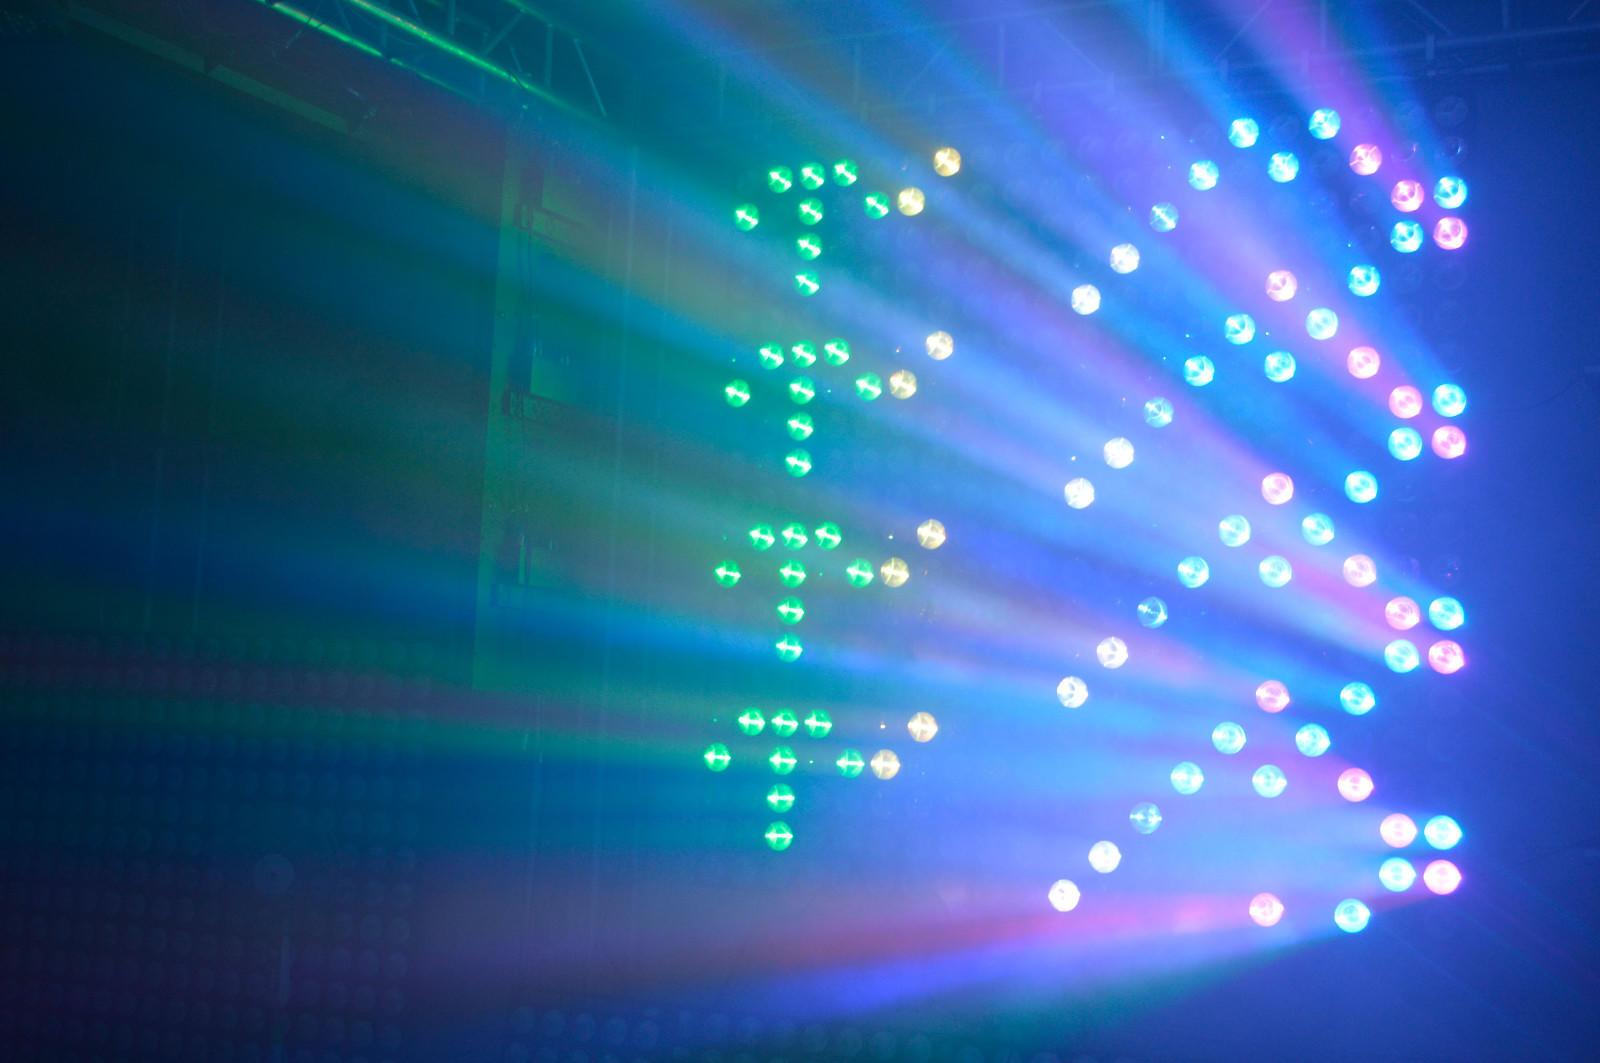 cob hot selling warm new led color changing lights Marslite Brand